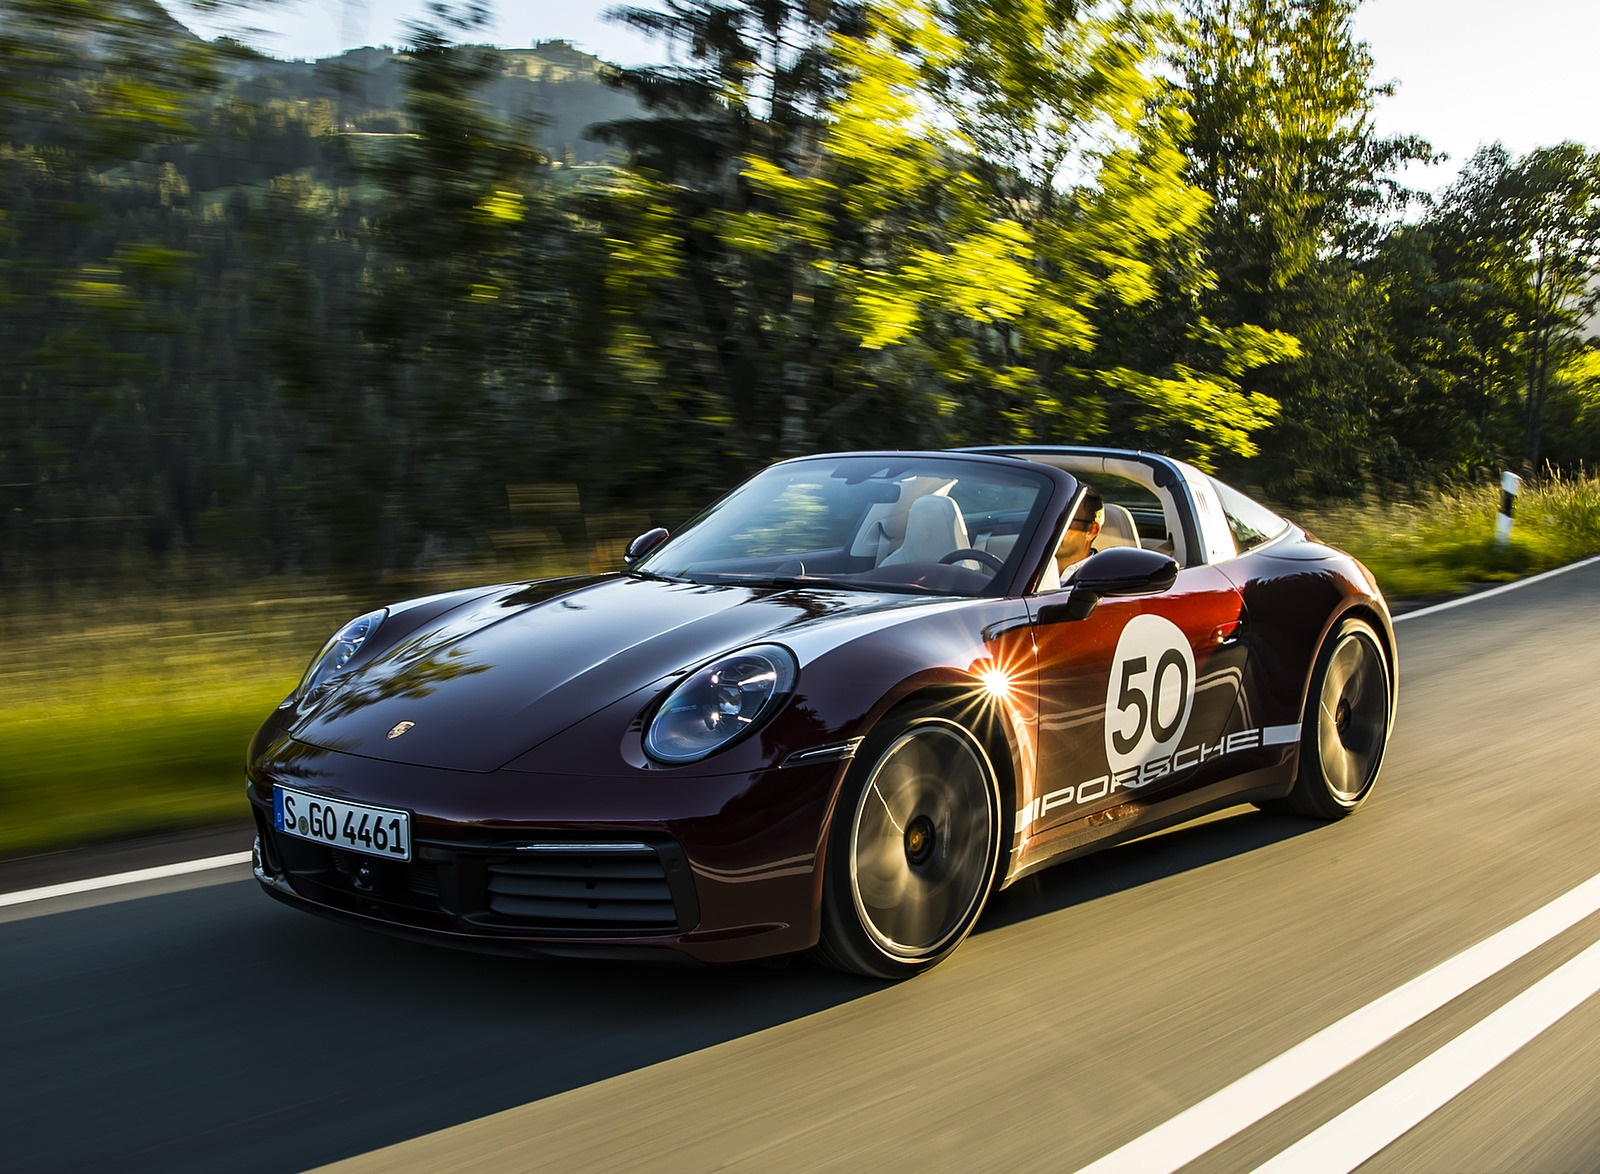 2021 Porsche 911 Targa 4S Heritage Design Edition (Color: Cherry Metallic) Front Three-Quarter Wallpapers (10)